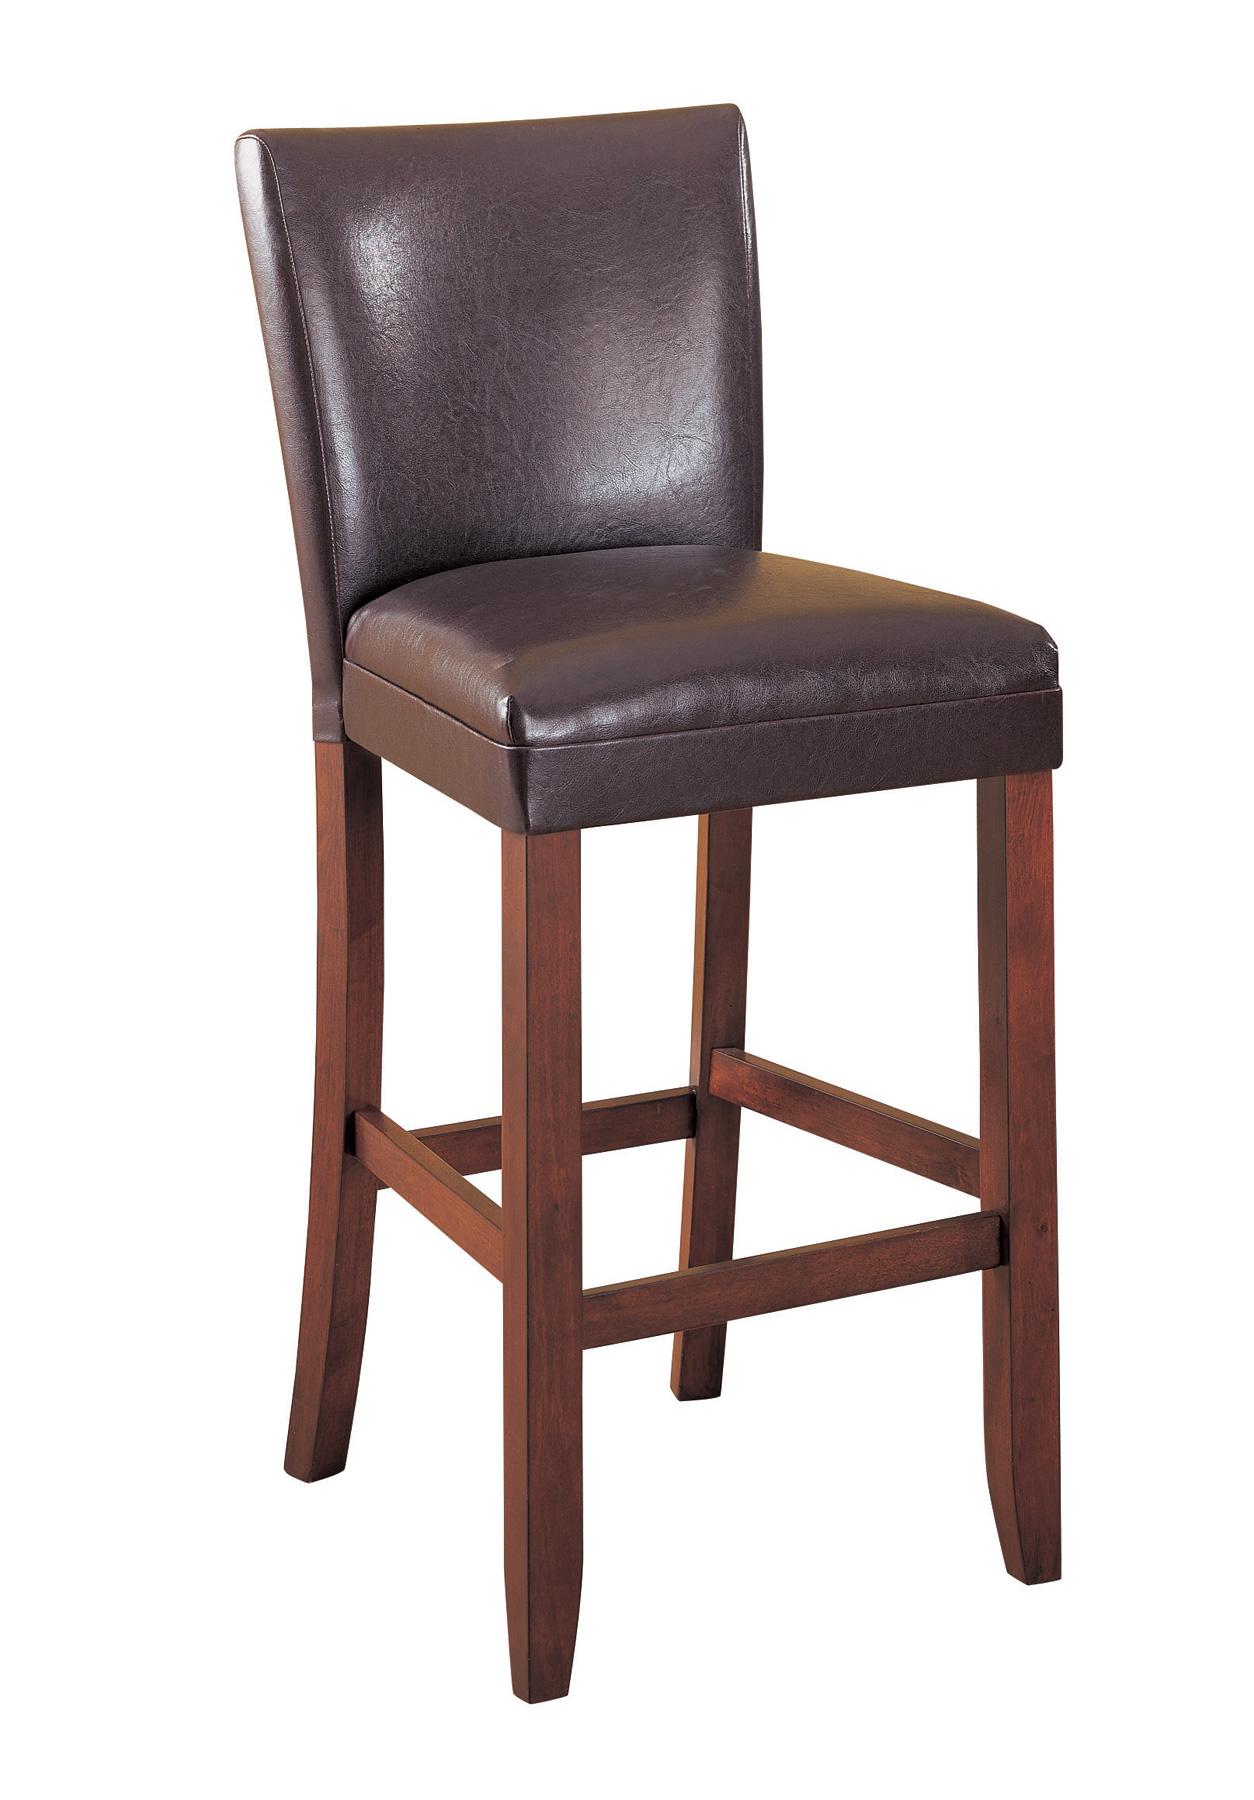 2 Coaster Furniture Cherry Brown Leather Like Vinyl Bar